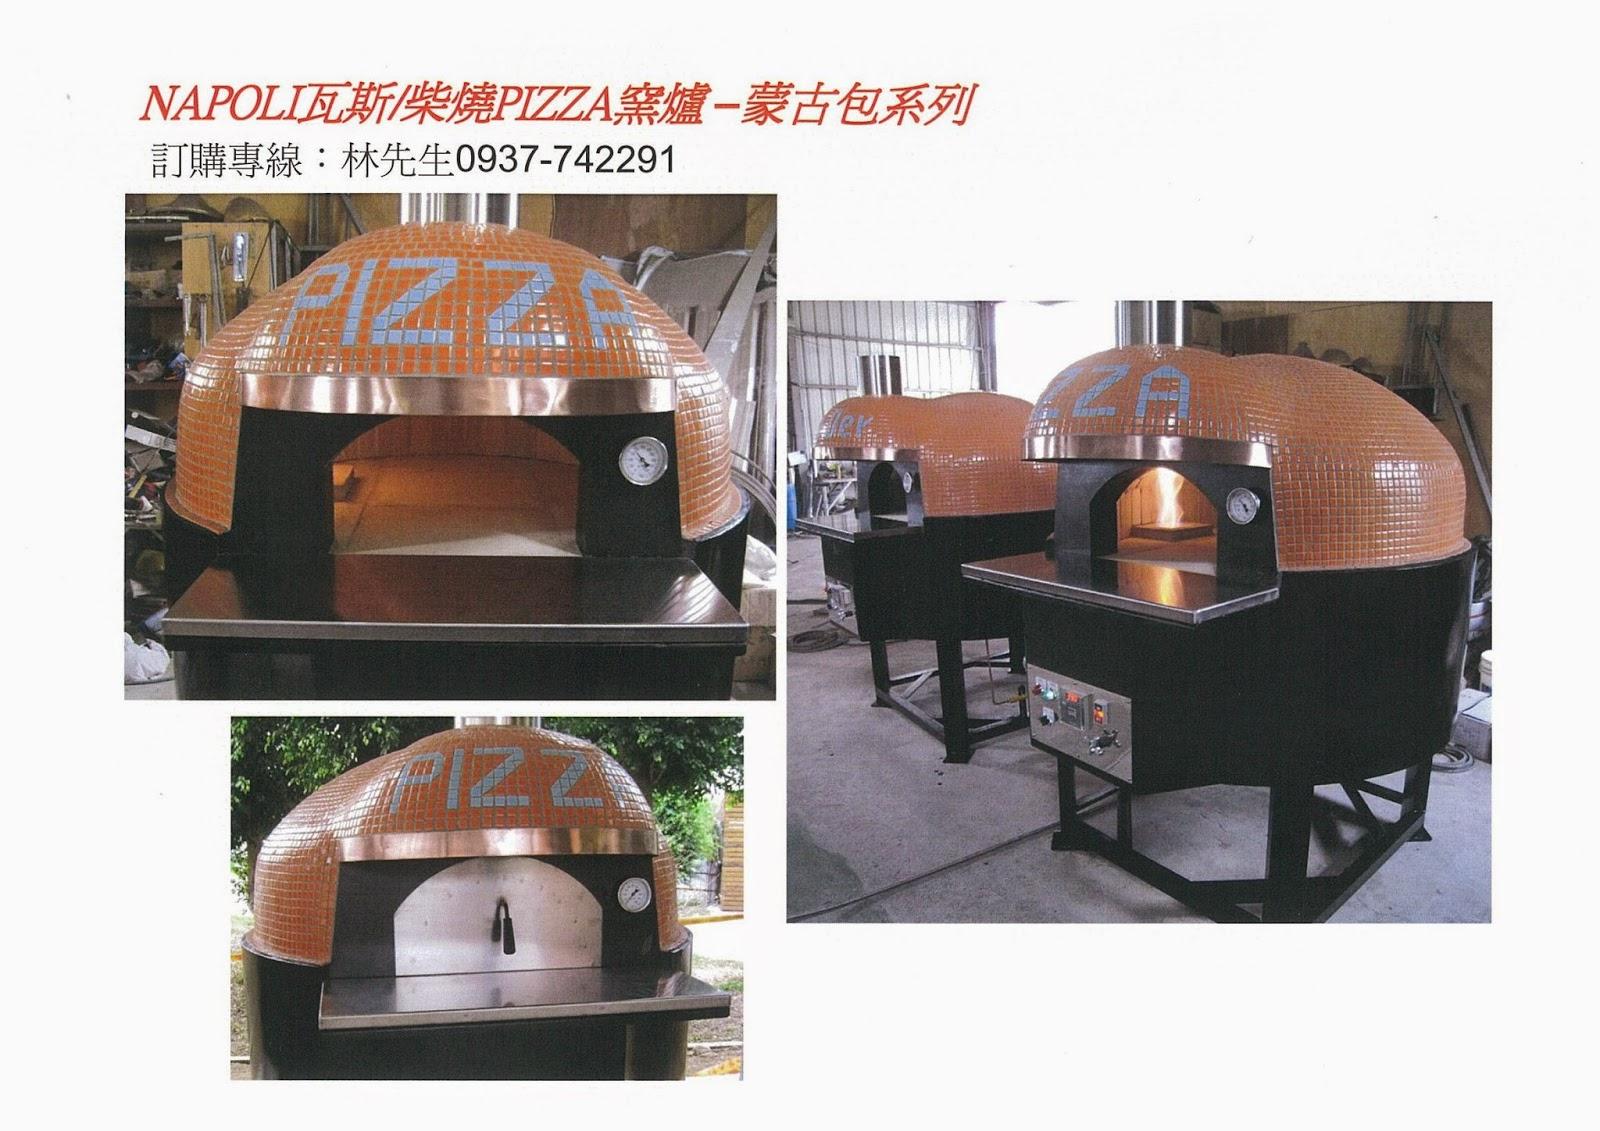 PIZZA窯爐/披薩烤爐&麵包窯爐&炭火爐: 瓦斯/柴燒PIZZA窯爐-蒙古包系列